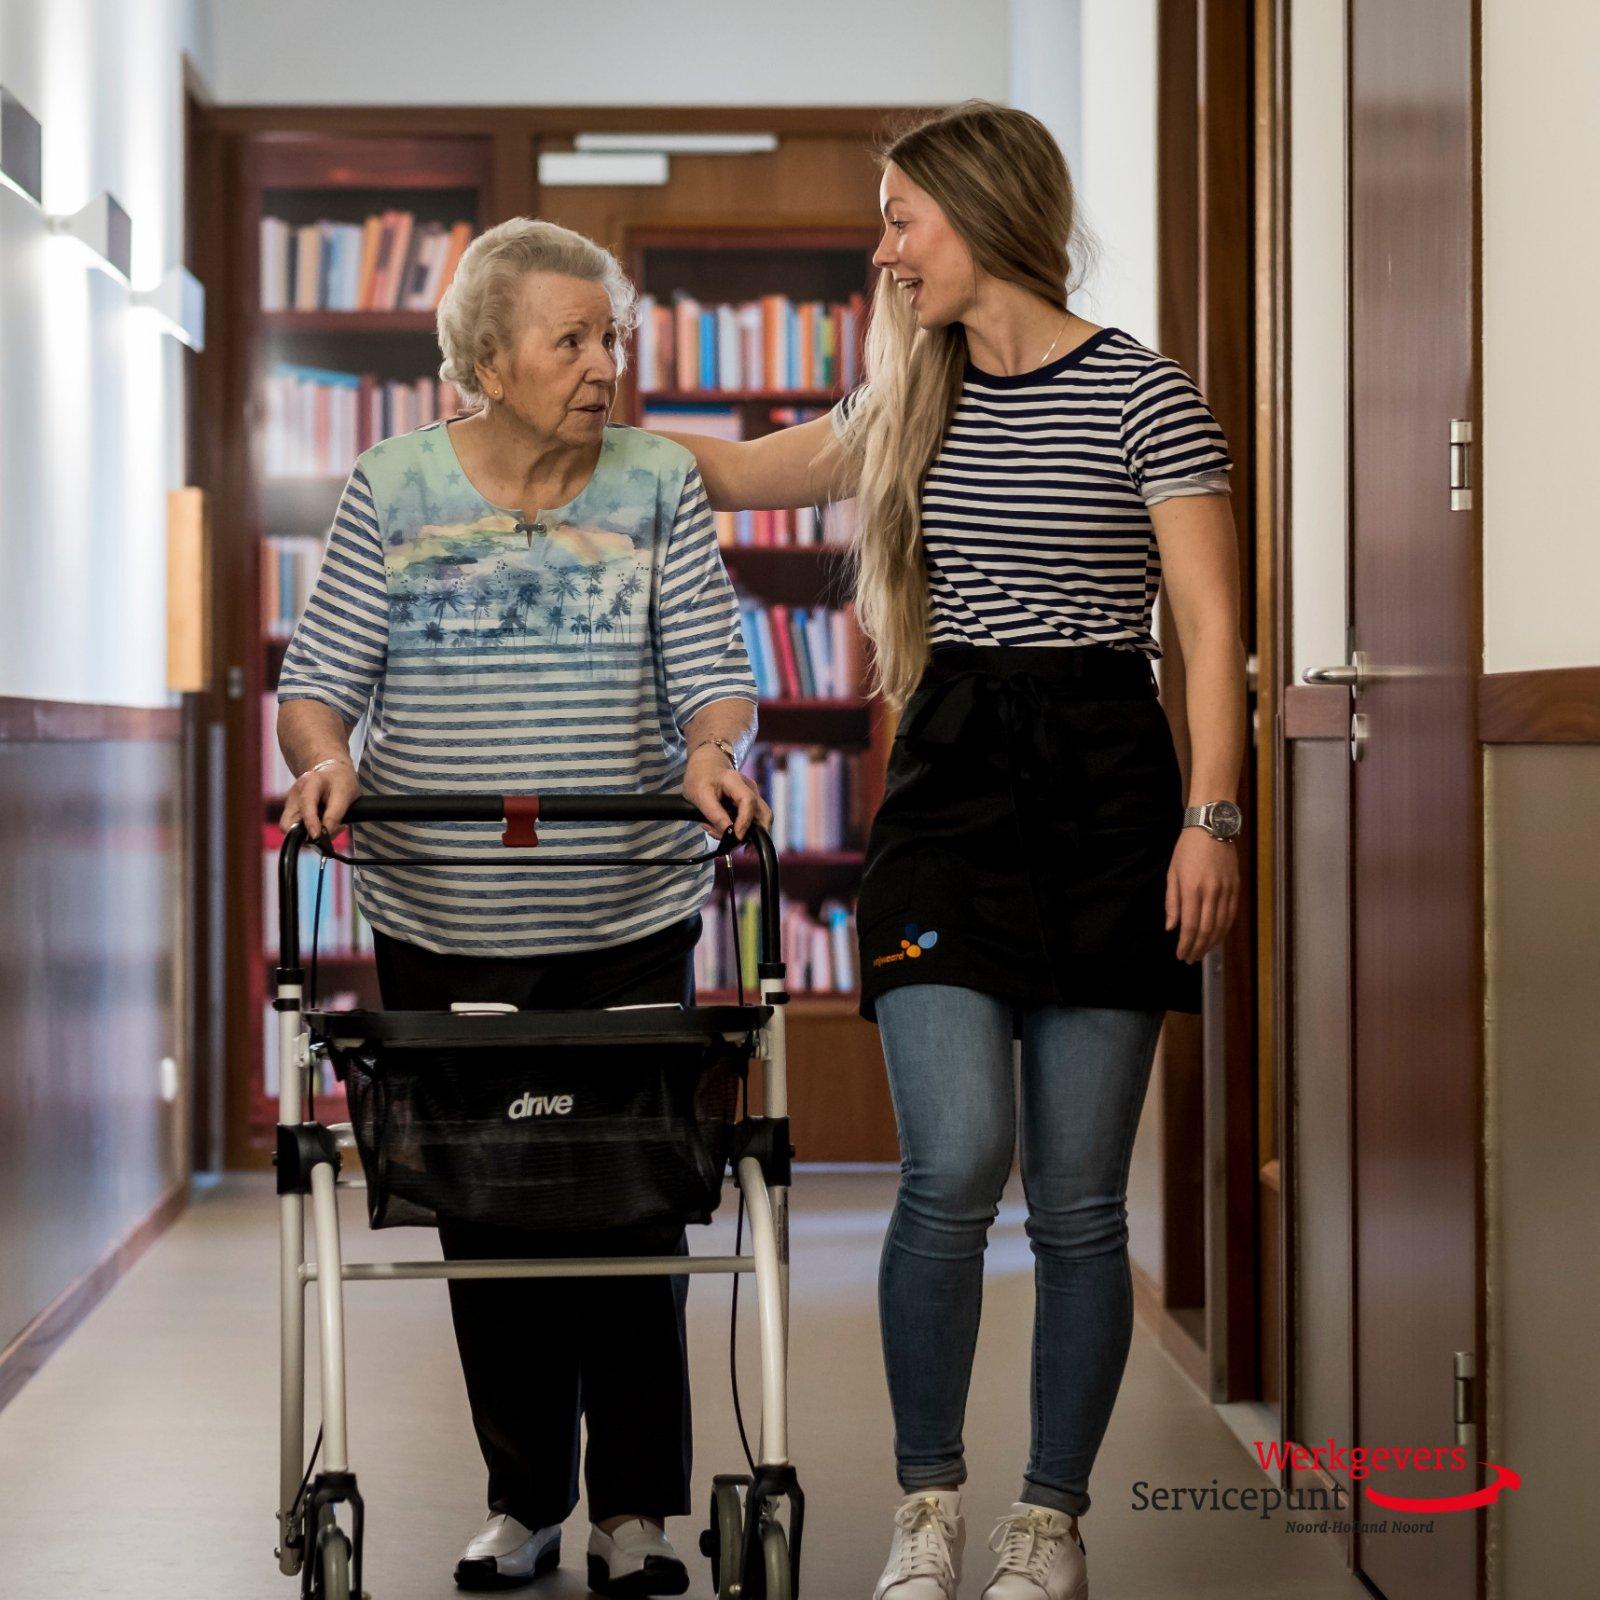 Meisje dat een oudere vrouw op weg helpt